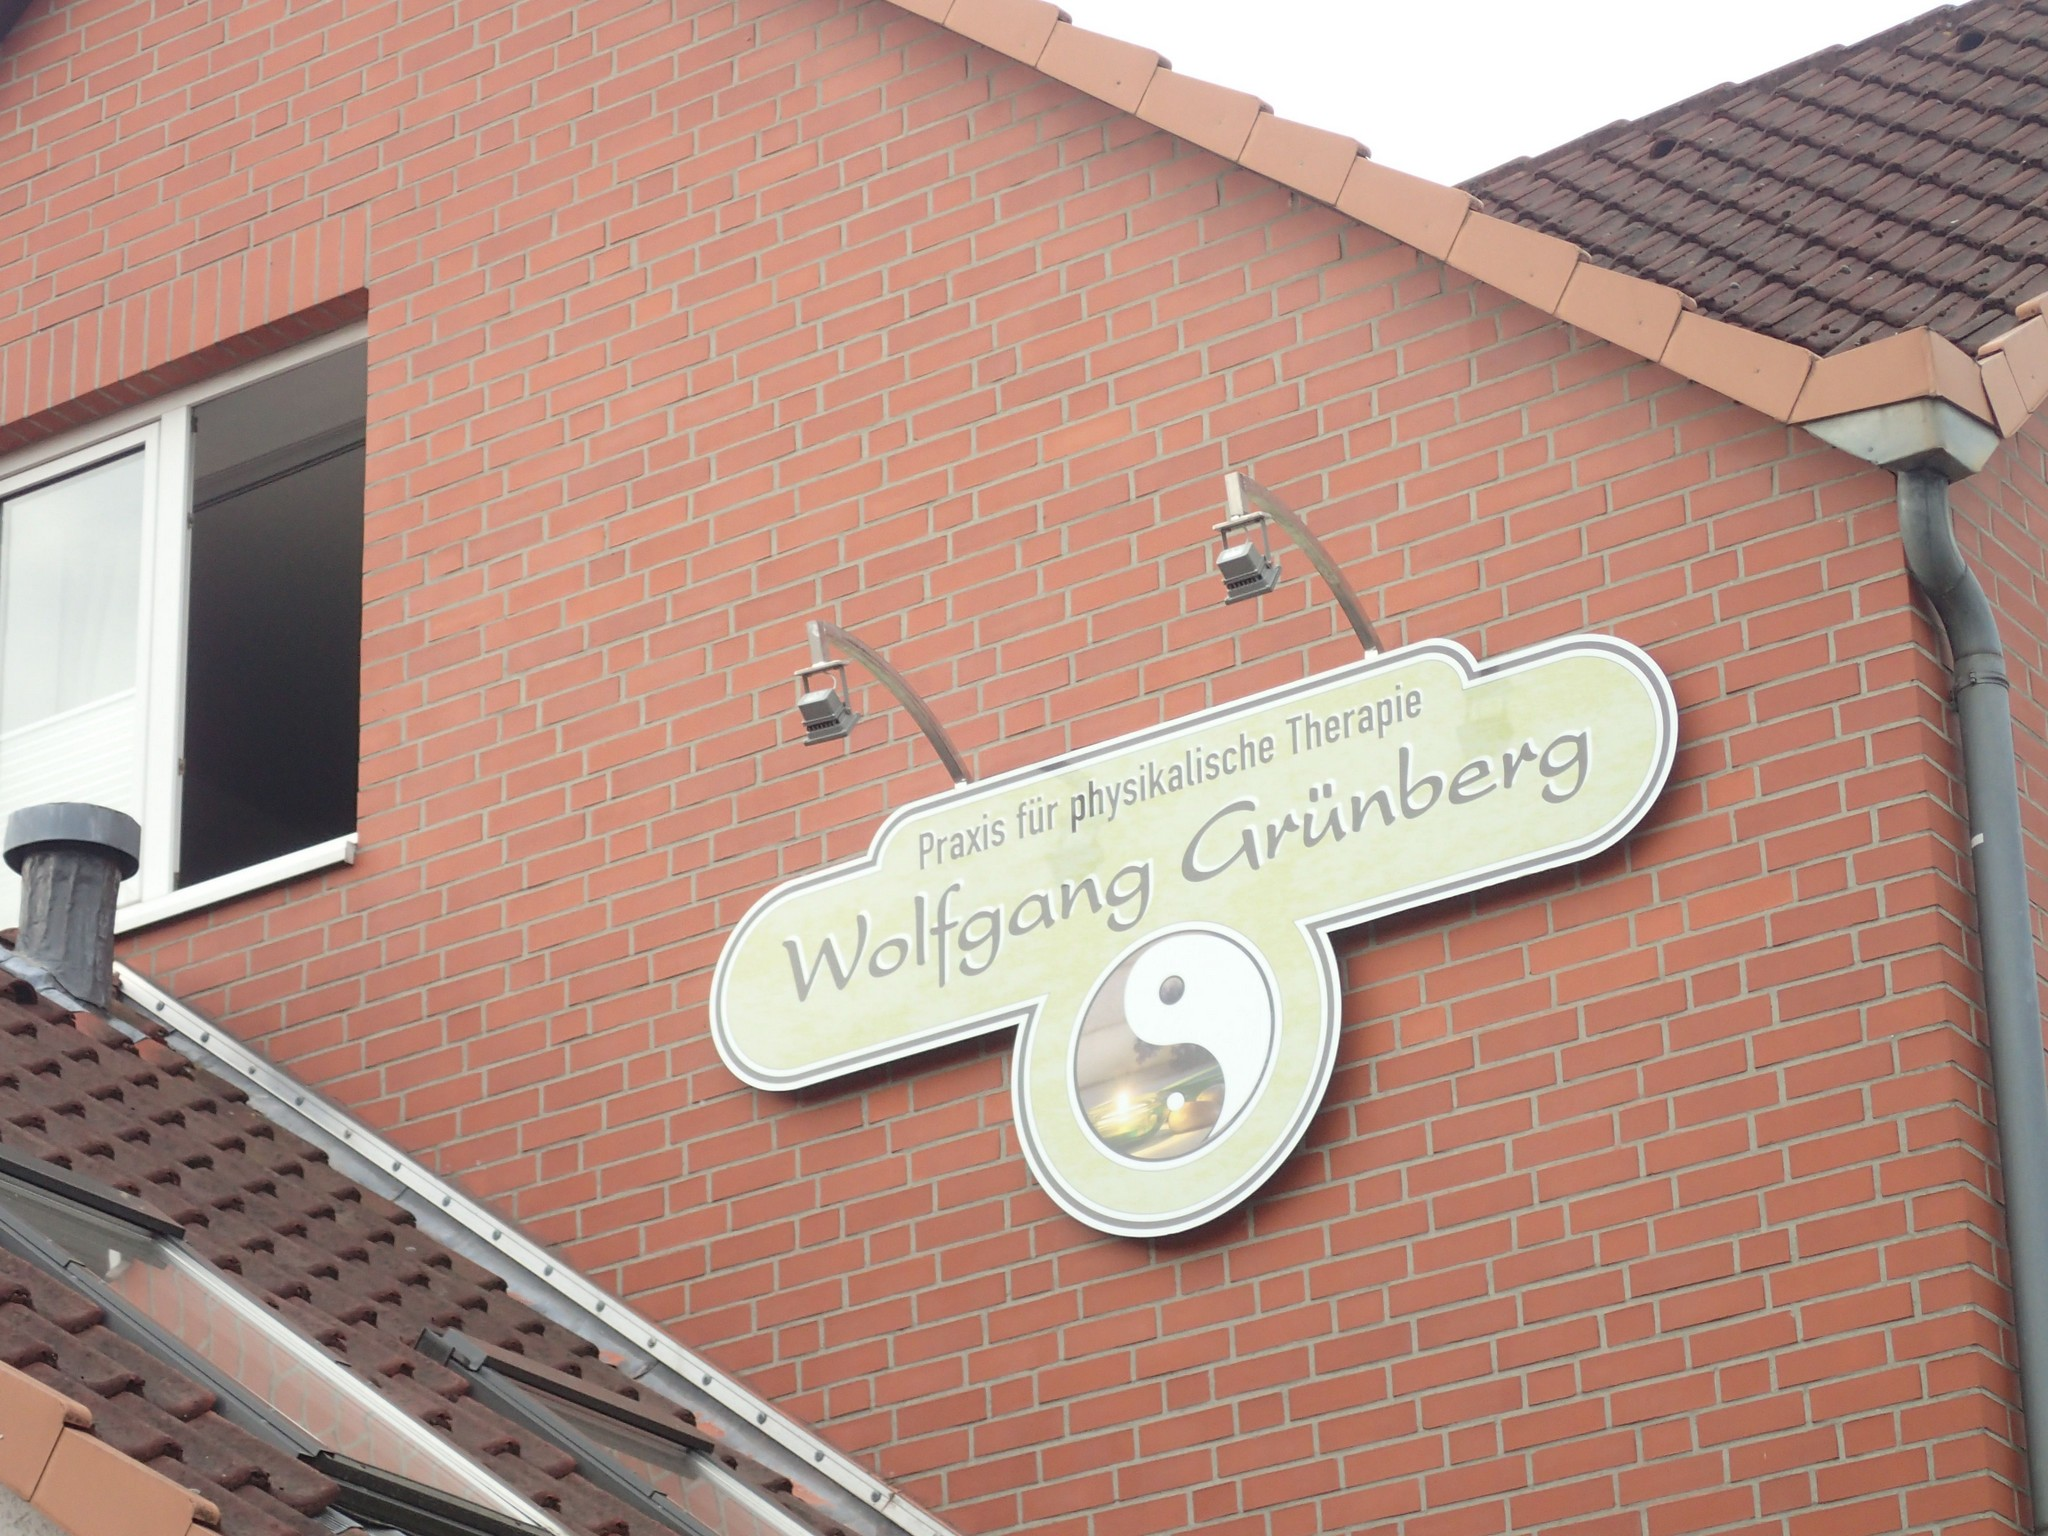 Gruenberg-Praxis-2